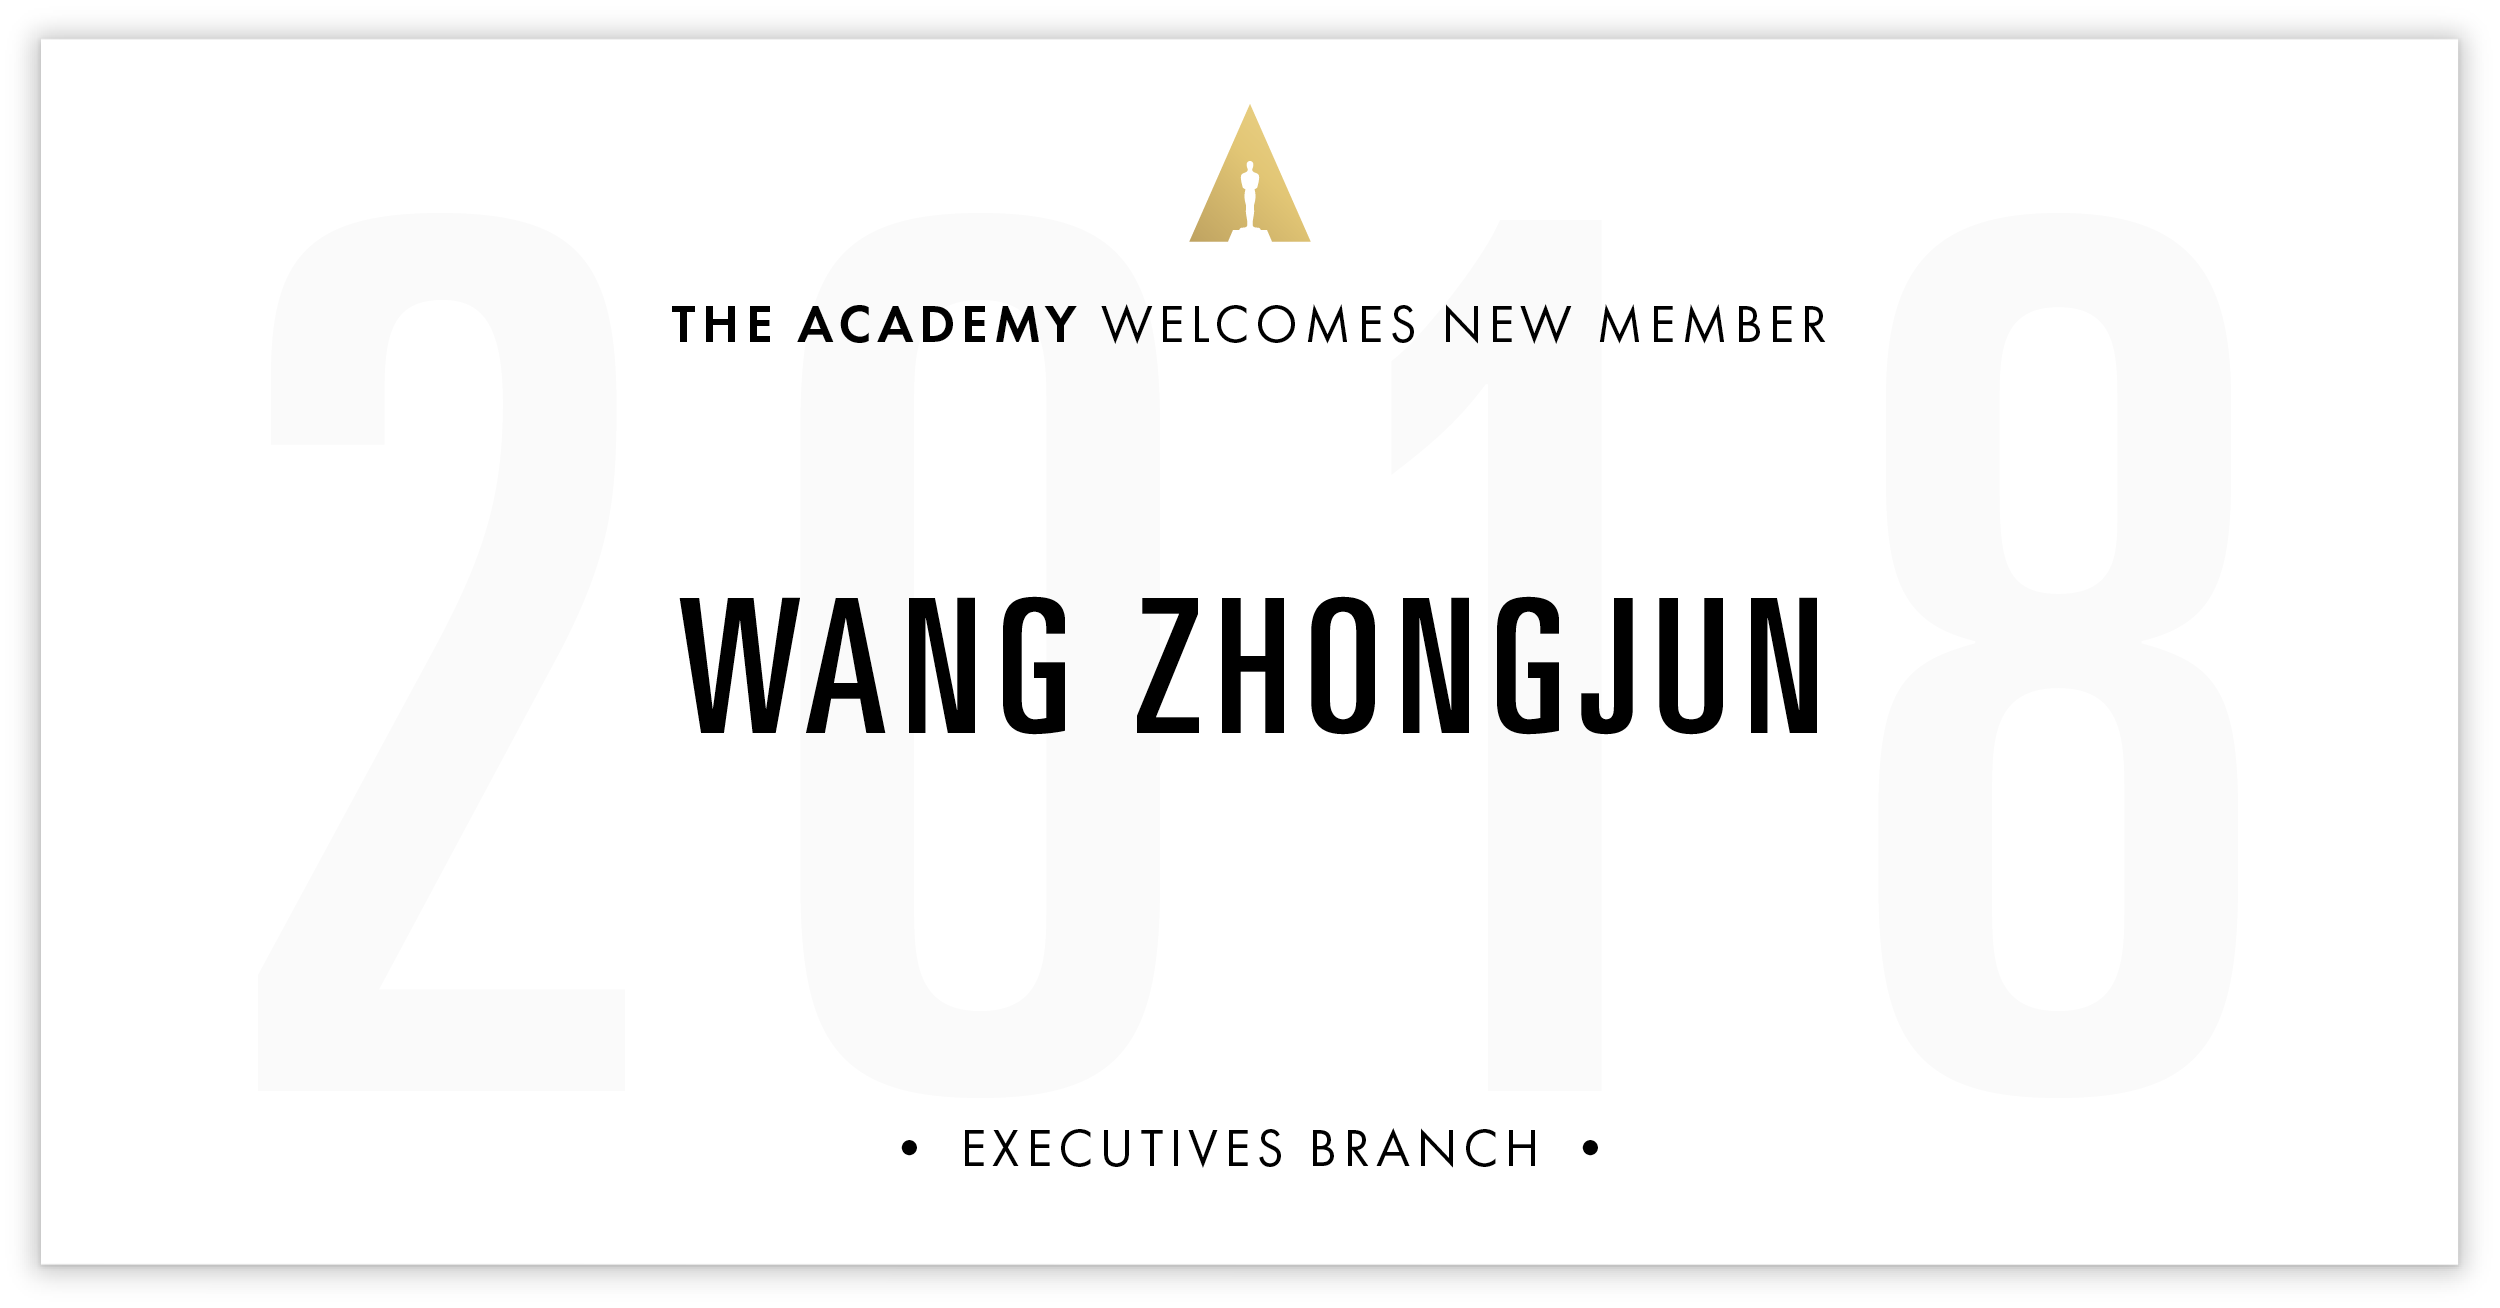 Wang Zhongjun is invited!